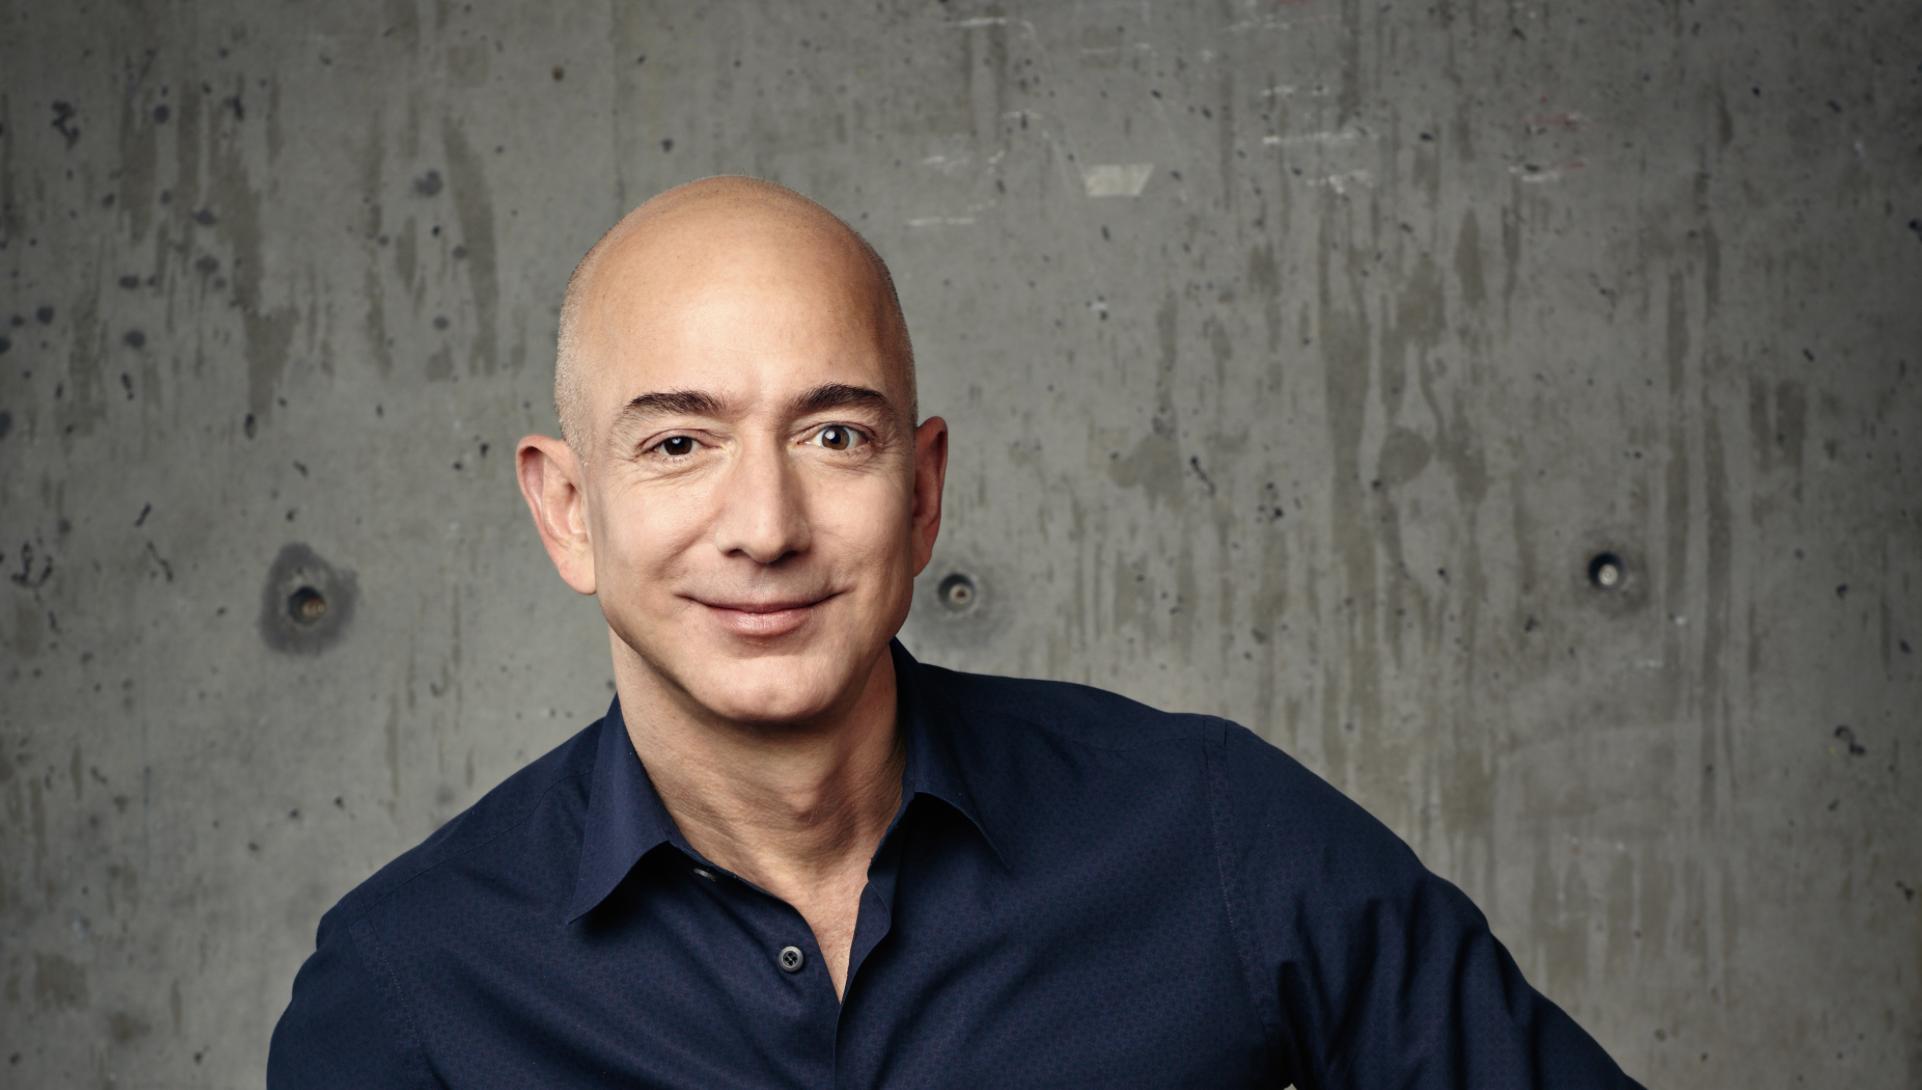 Amazon.com CEO Jeff Bezos